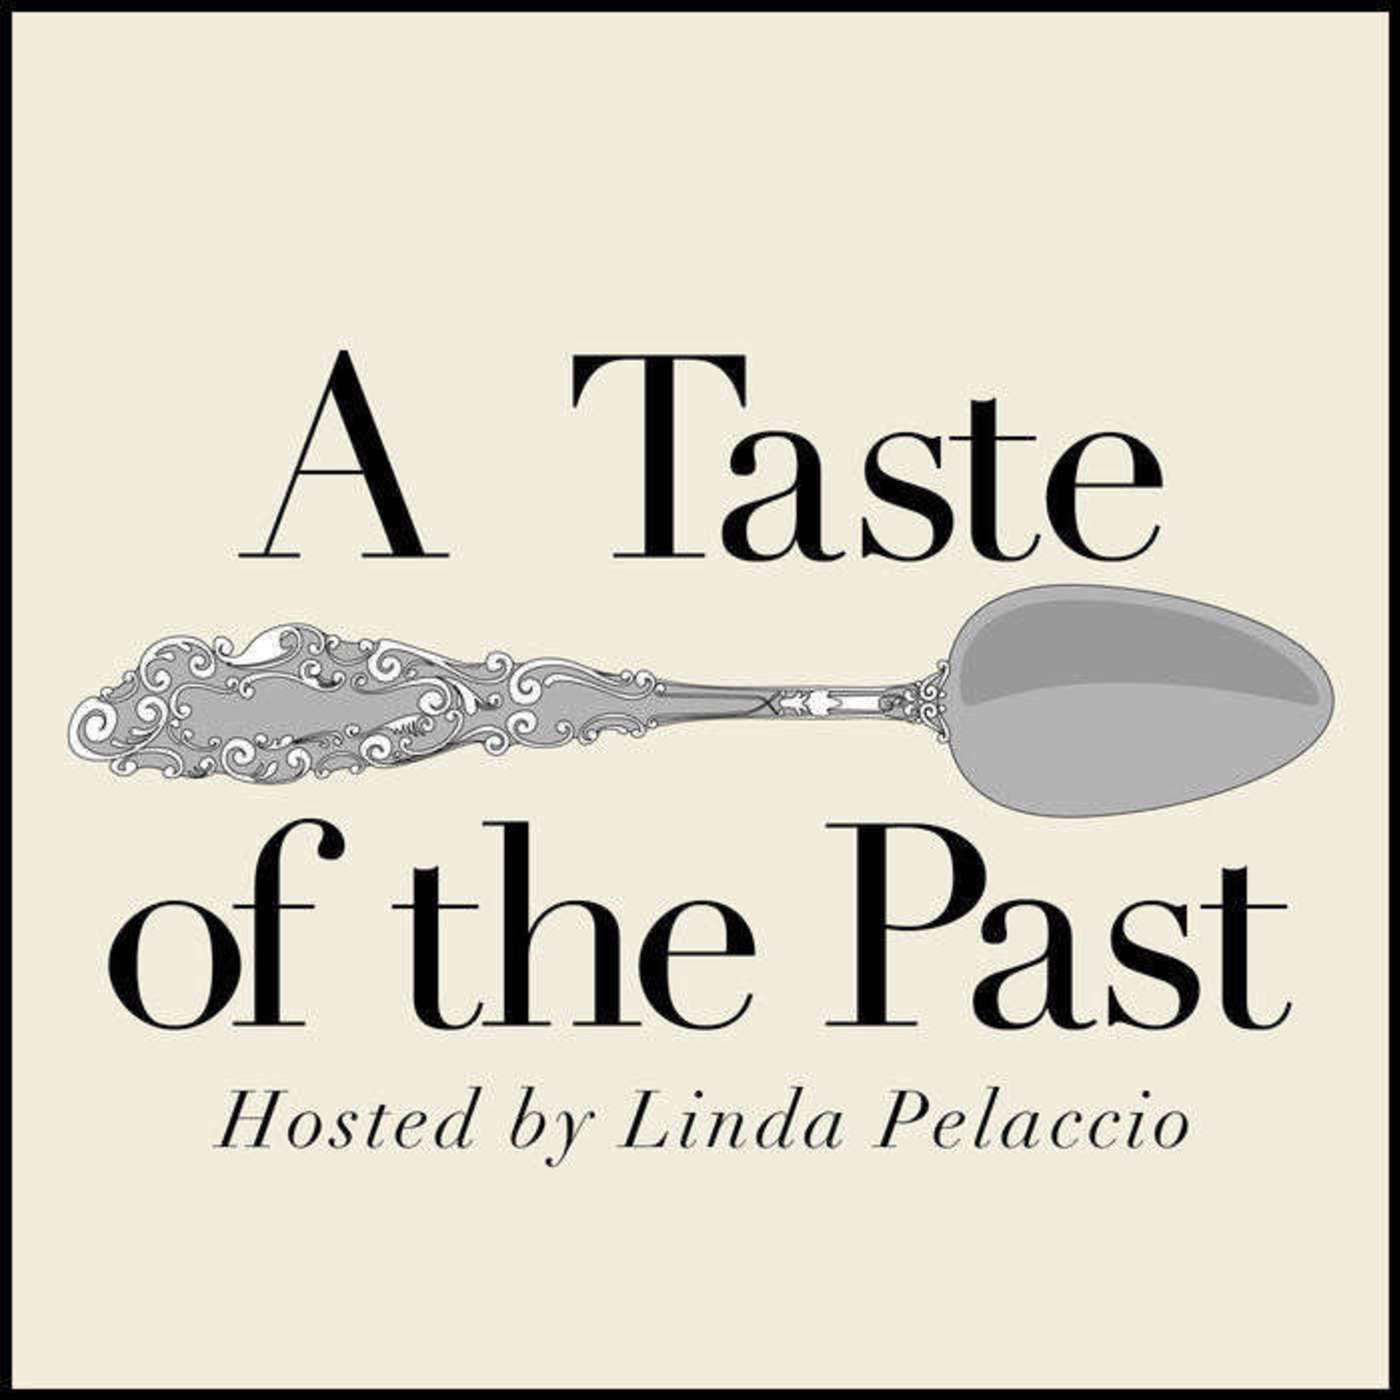 Episode 190: Longevity Food